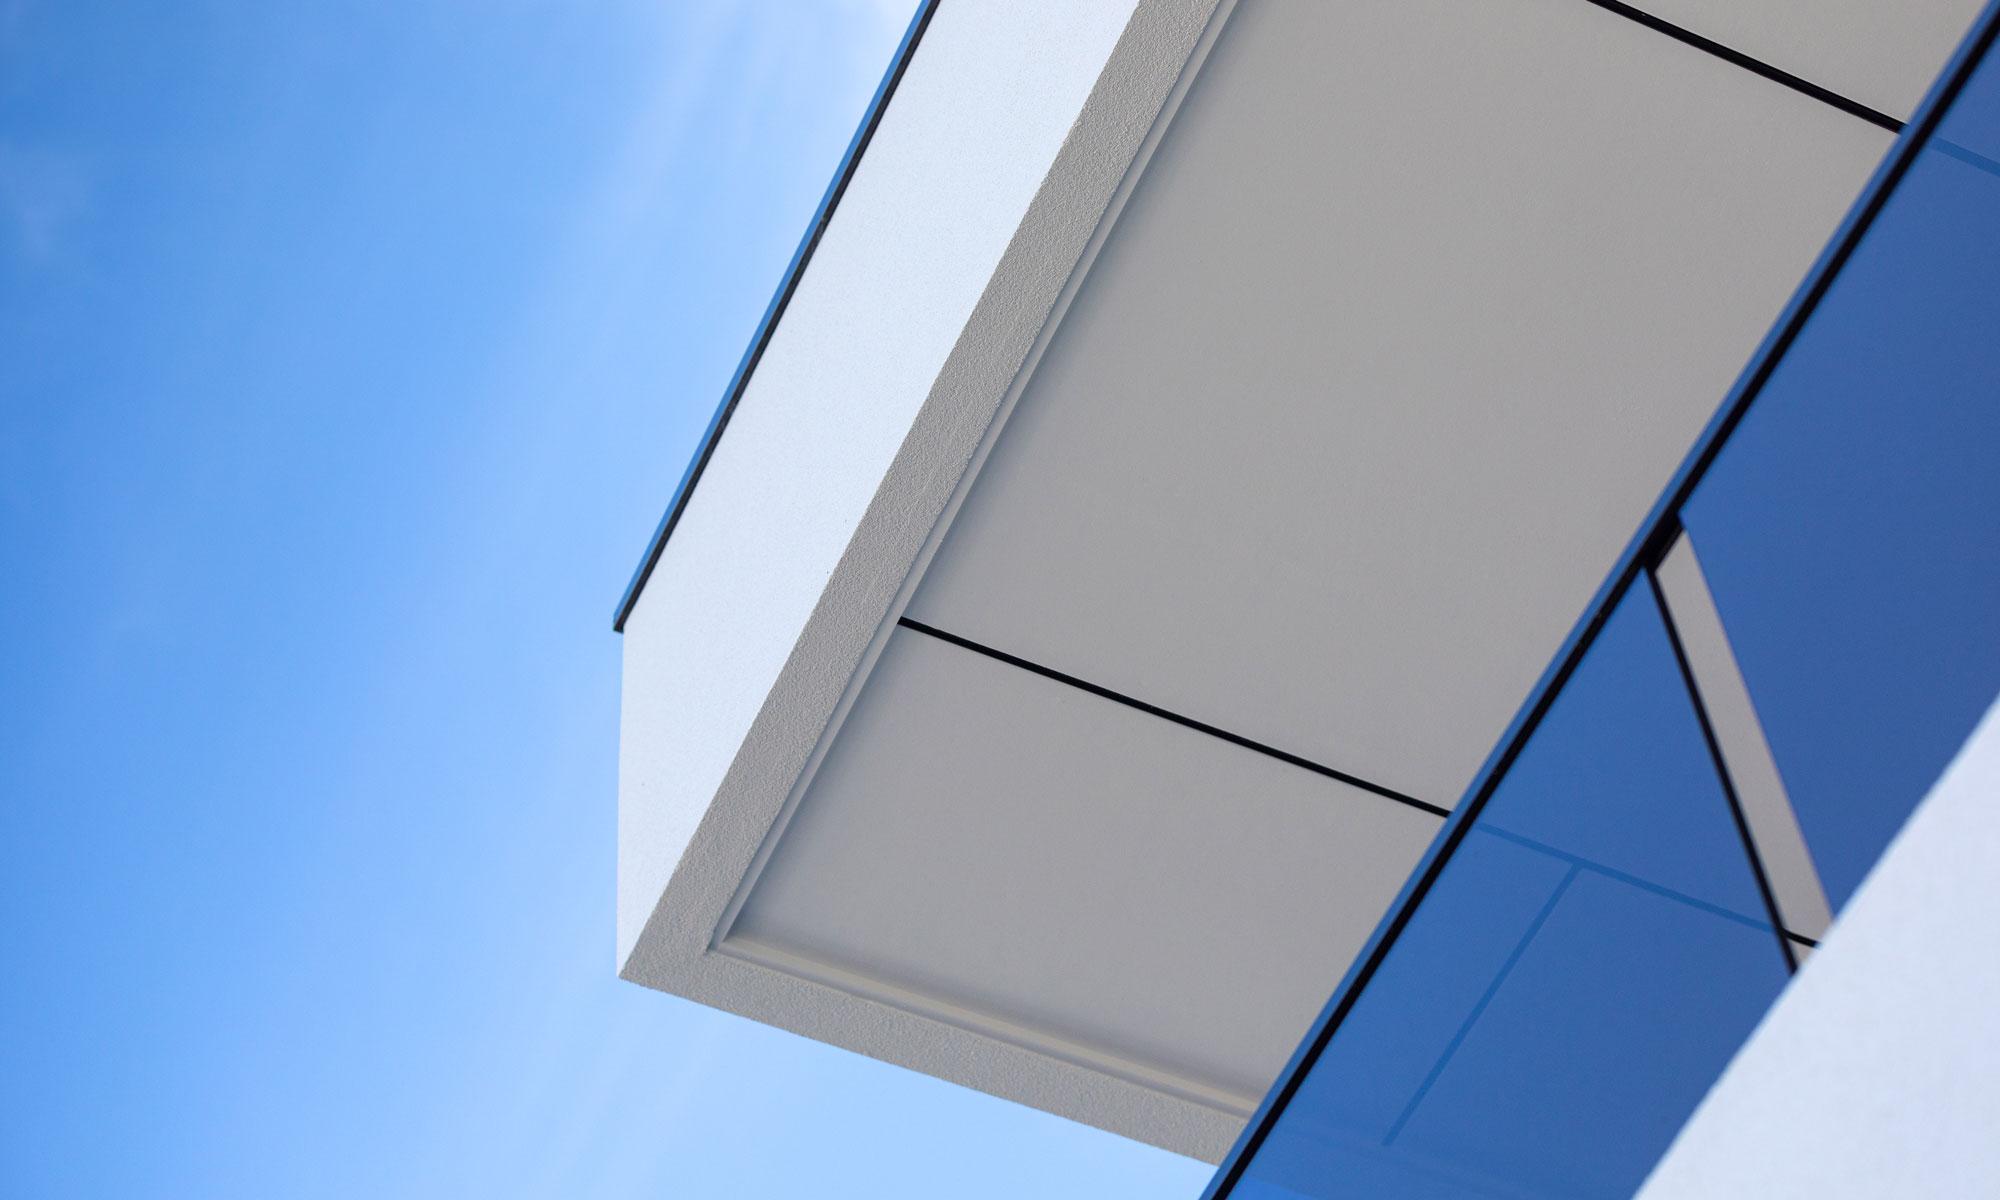 Somerton Park architectural detail